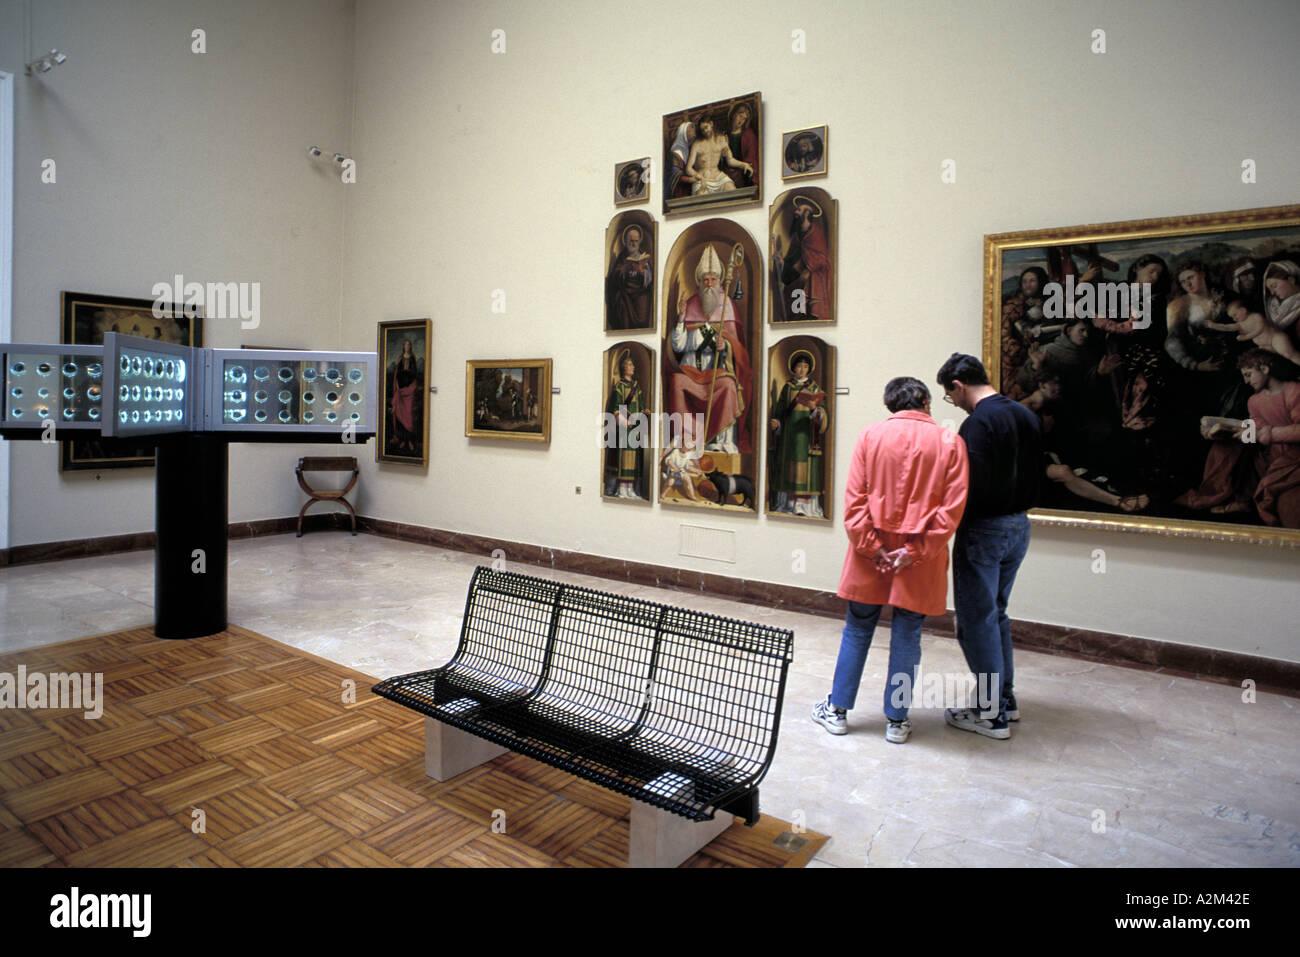 Accademia Carrara - Stock Image